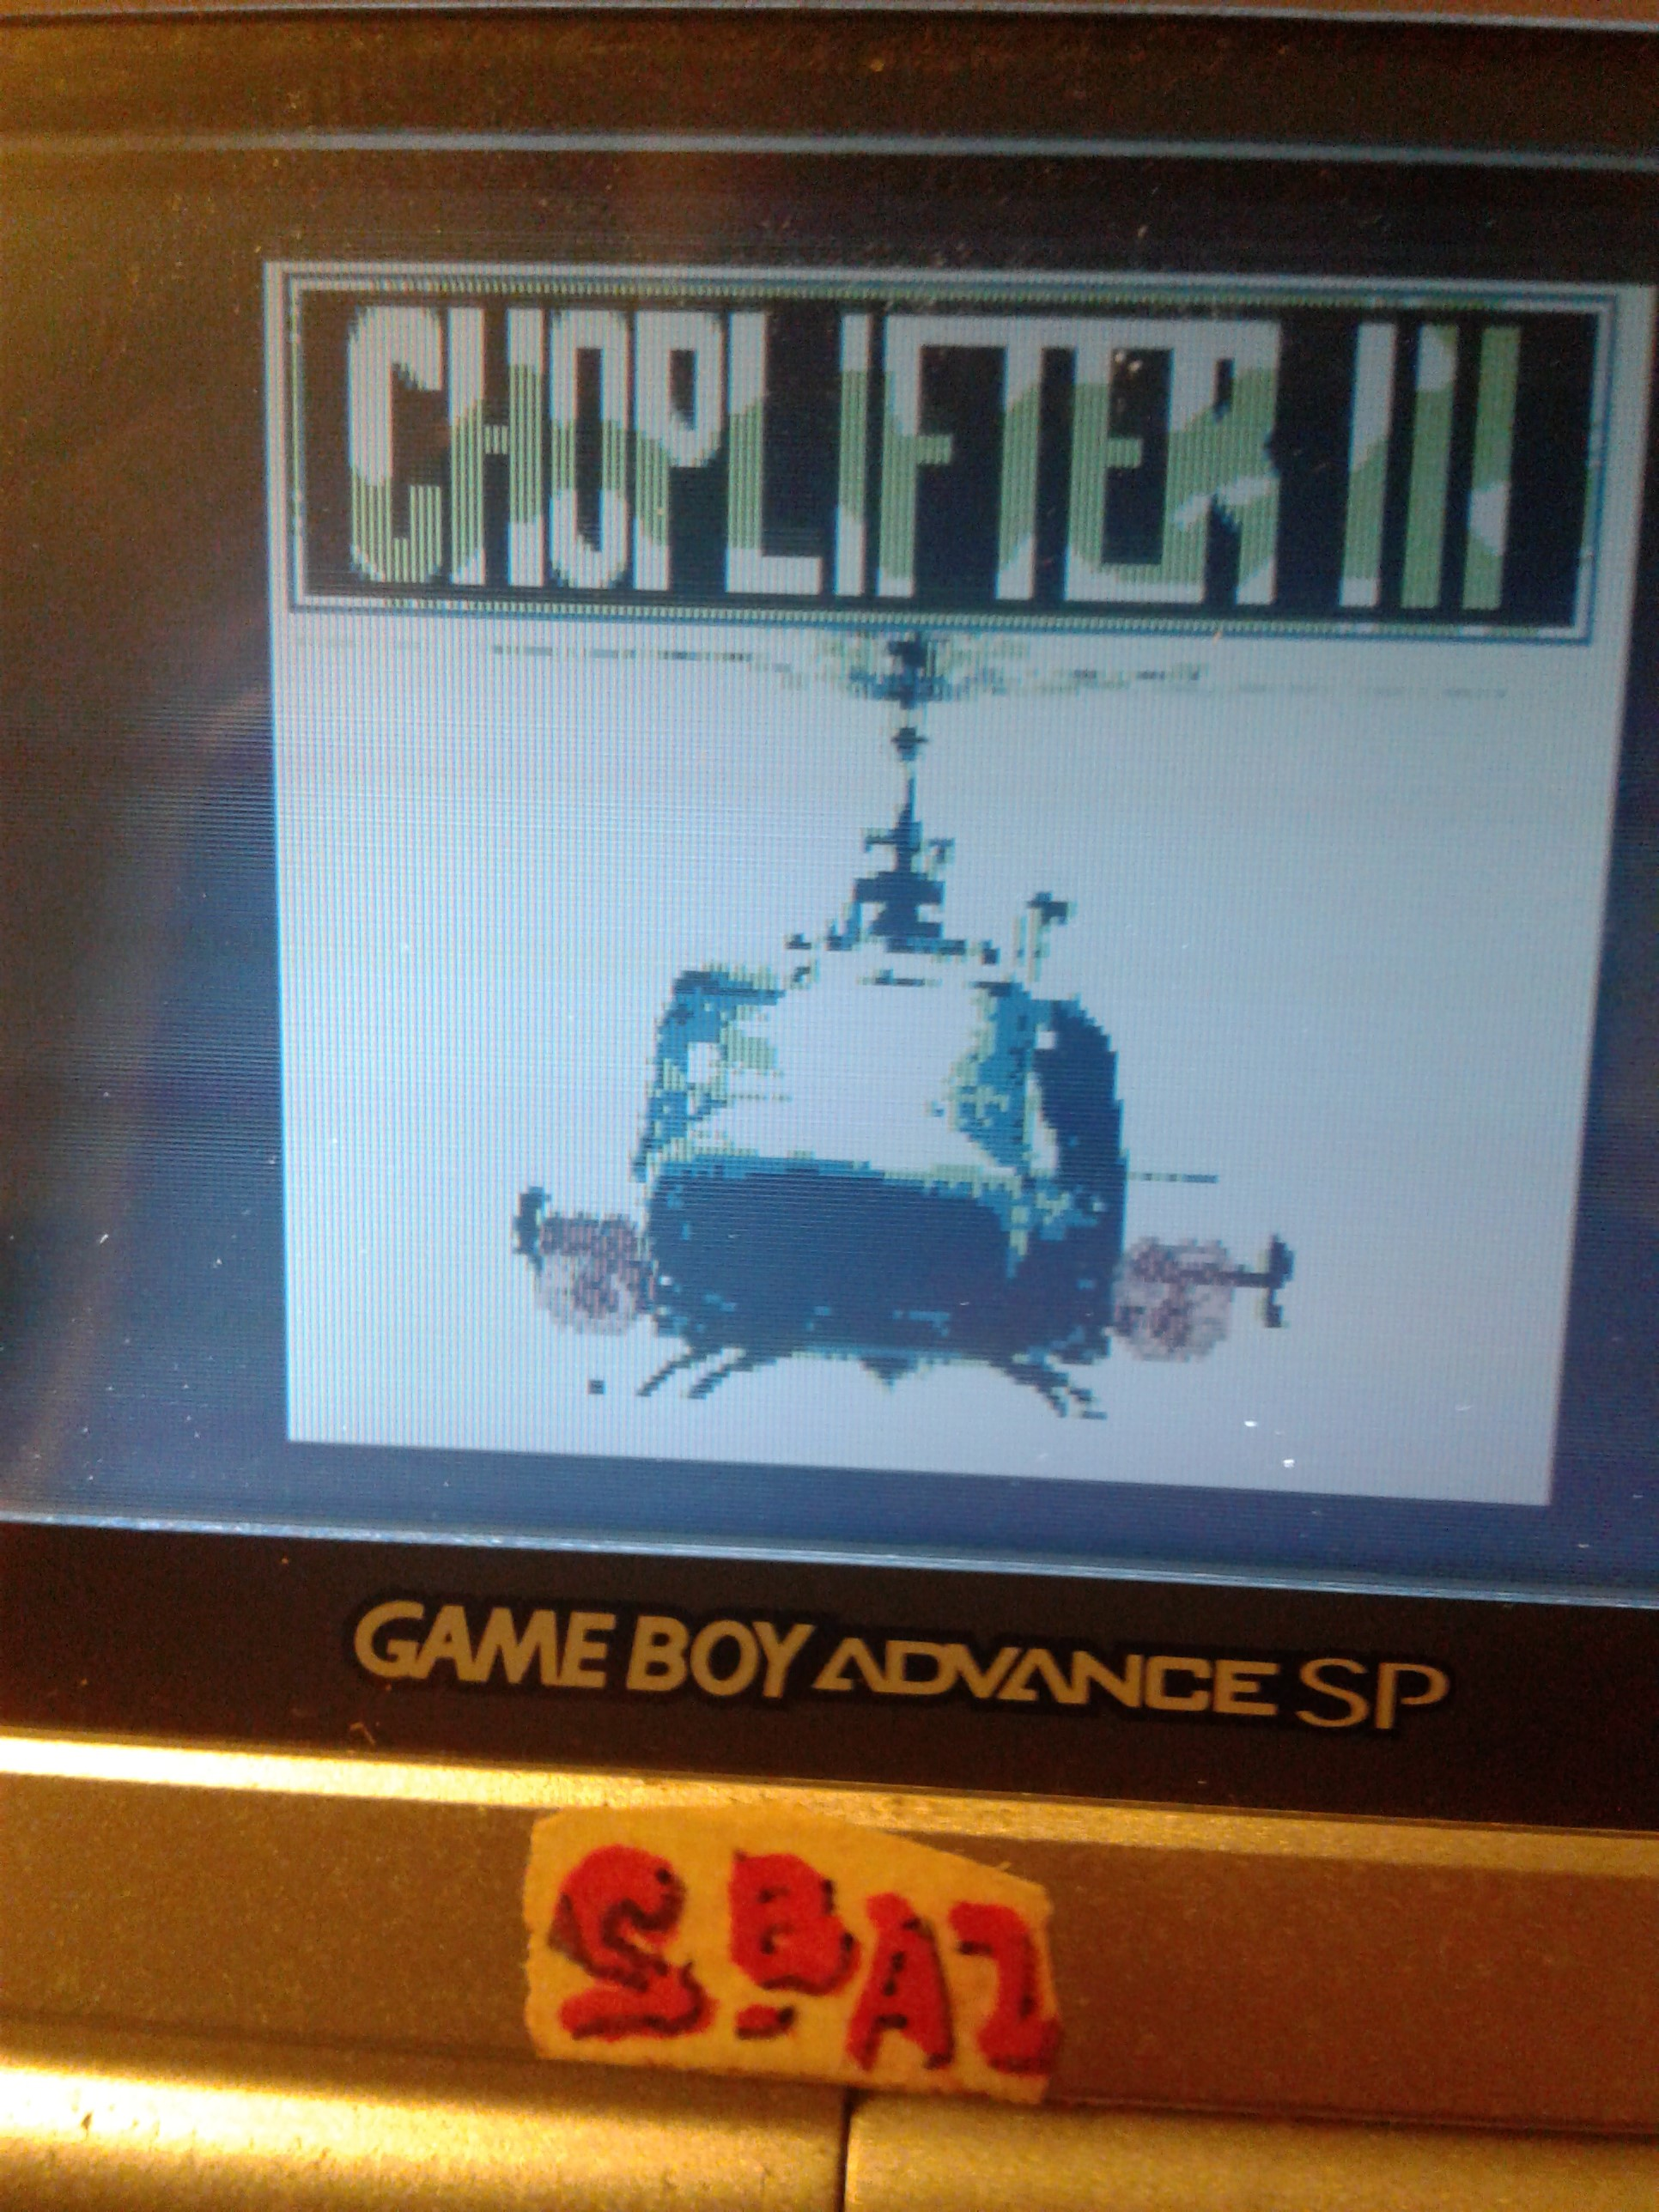 S.BAZ: Choplifter III (Game Boy) 4,010 points on 2019-07-23 23:39:36